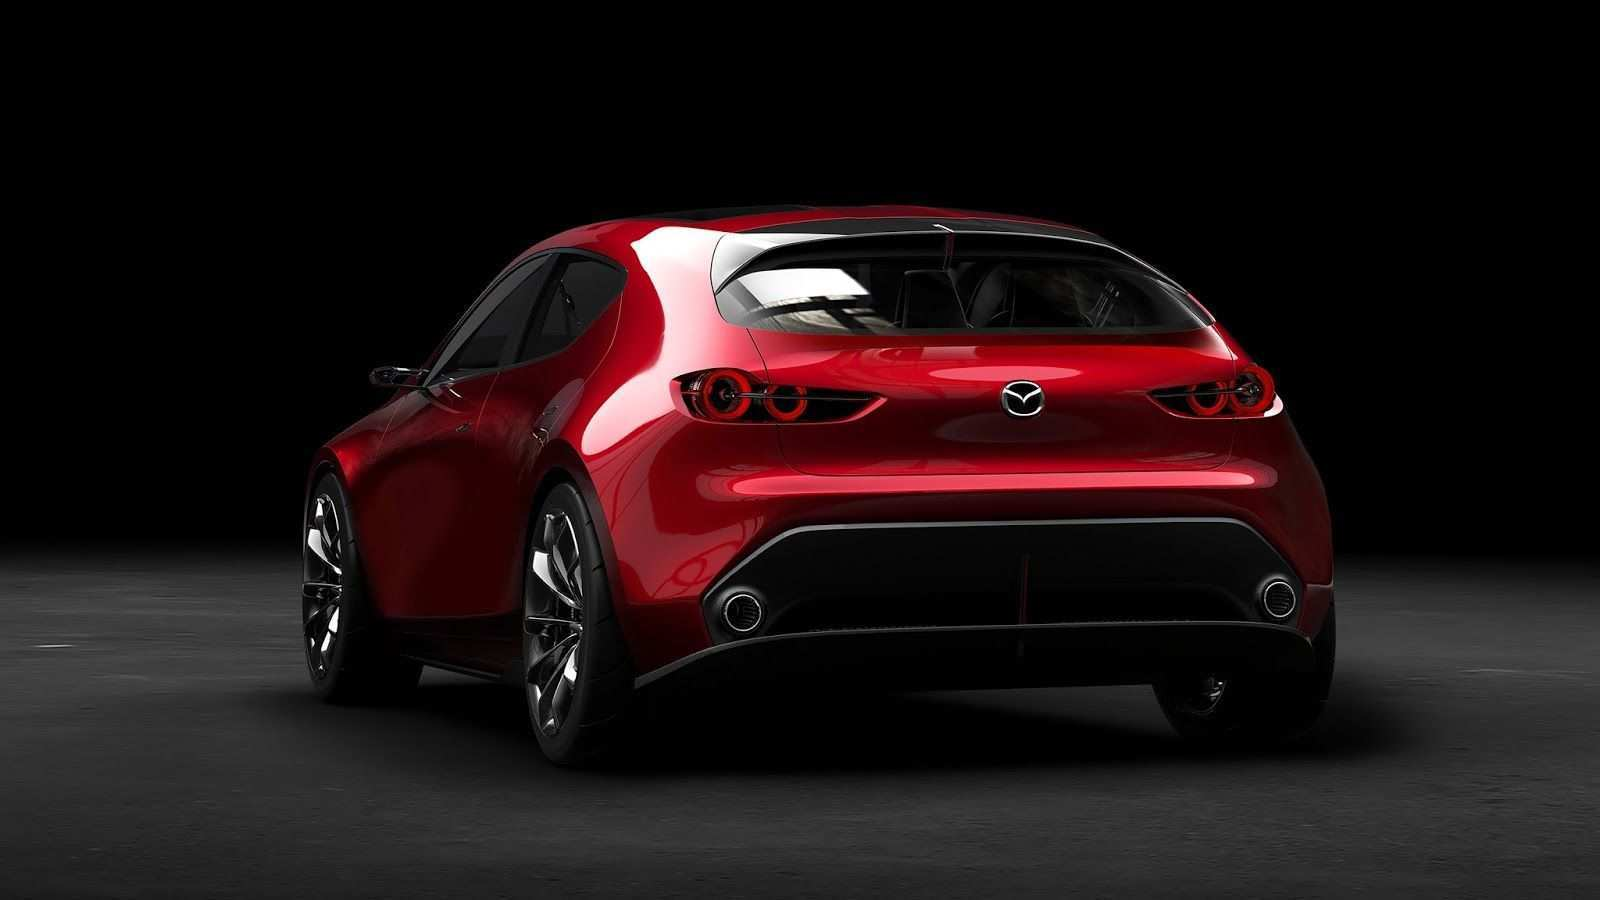 74 New Best 2019 Yaris Mazda Rumors Specs by Best 2019 Yaris Mazda Rumors